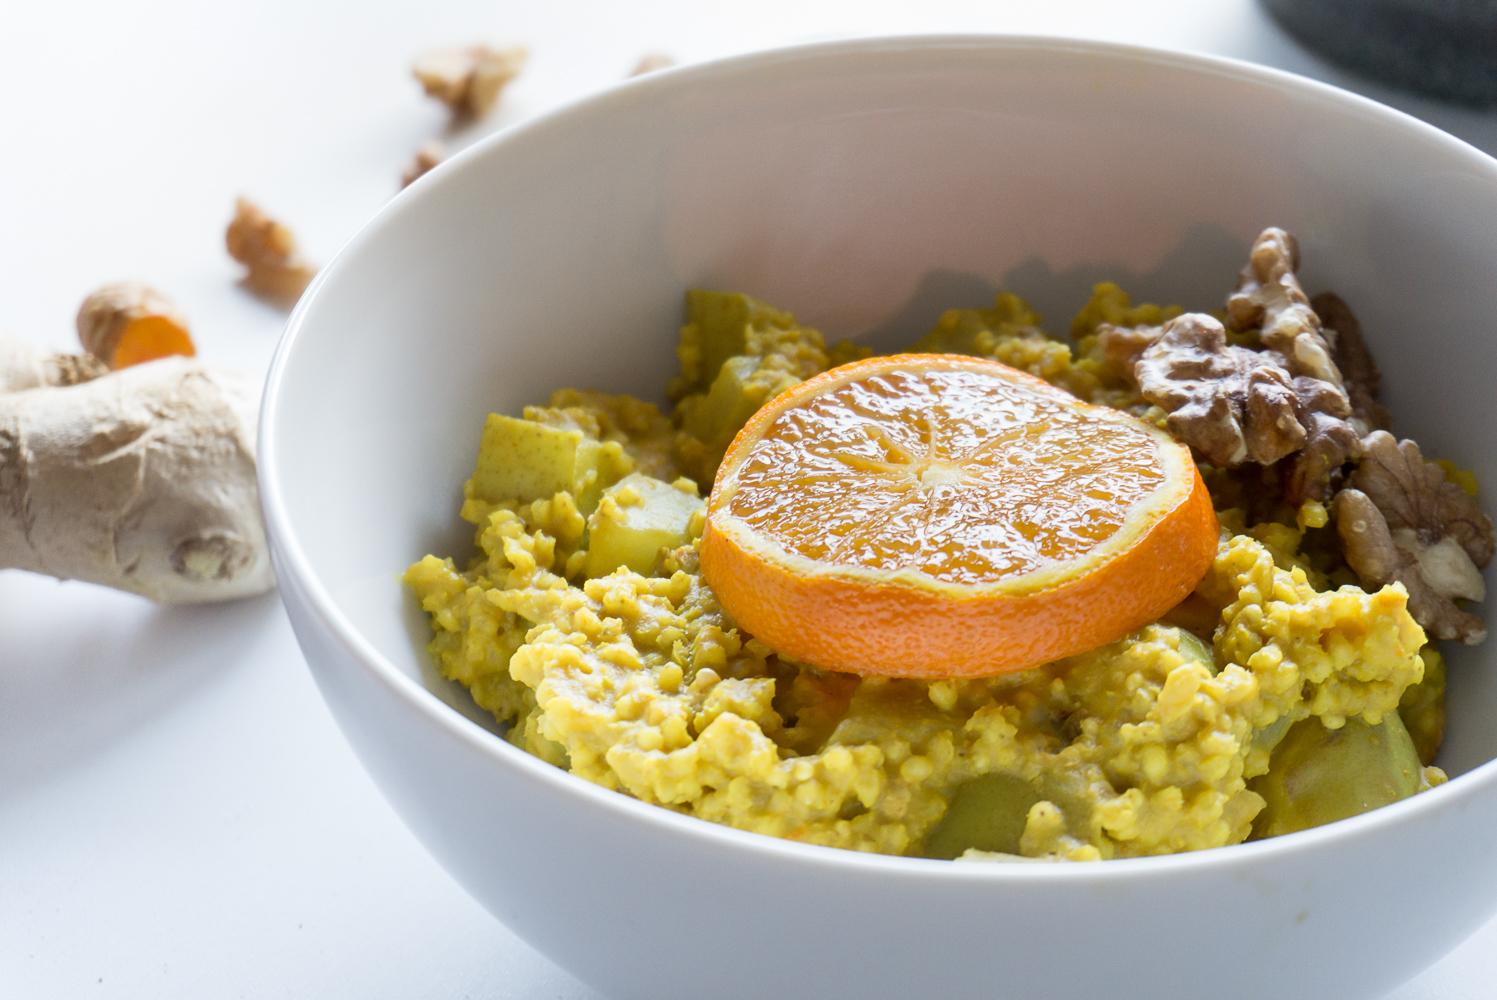 Goldener Hirseporridge01_Kurkuma_Joyfood_Sabrina Egg_Diätologie_Foodblogger